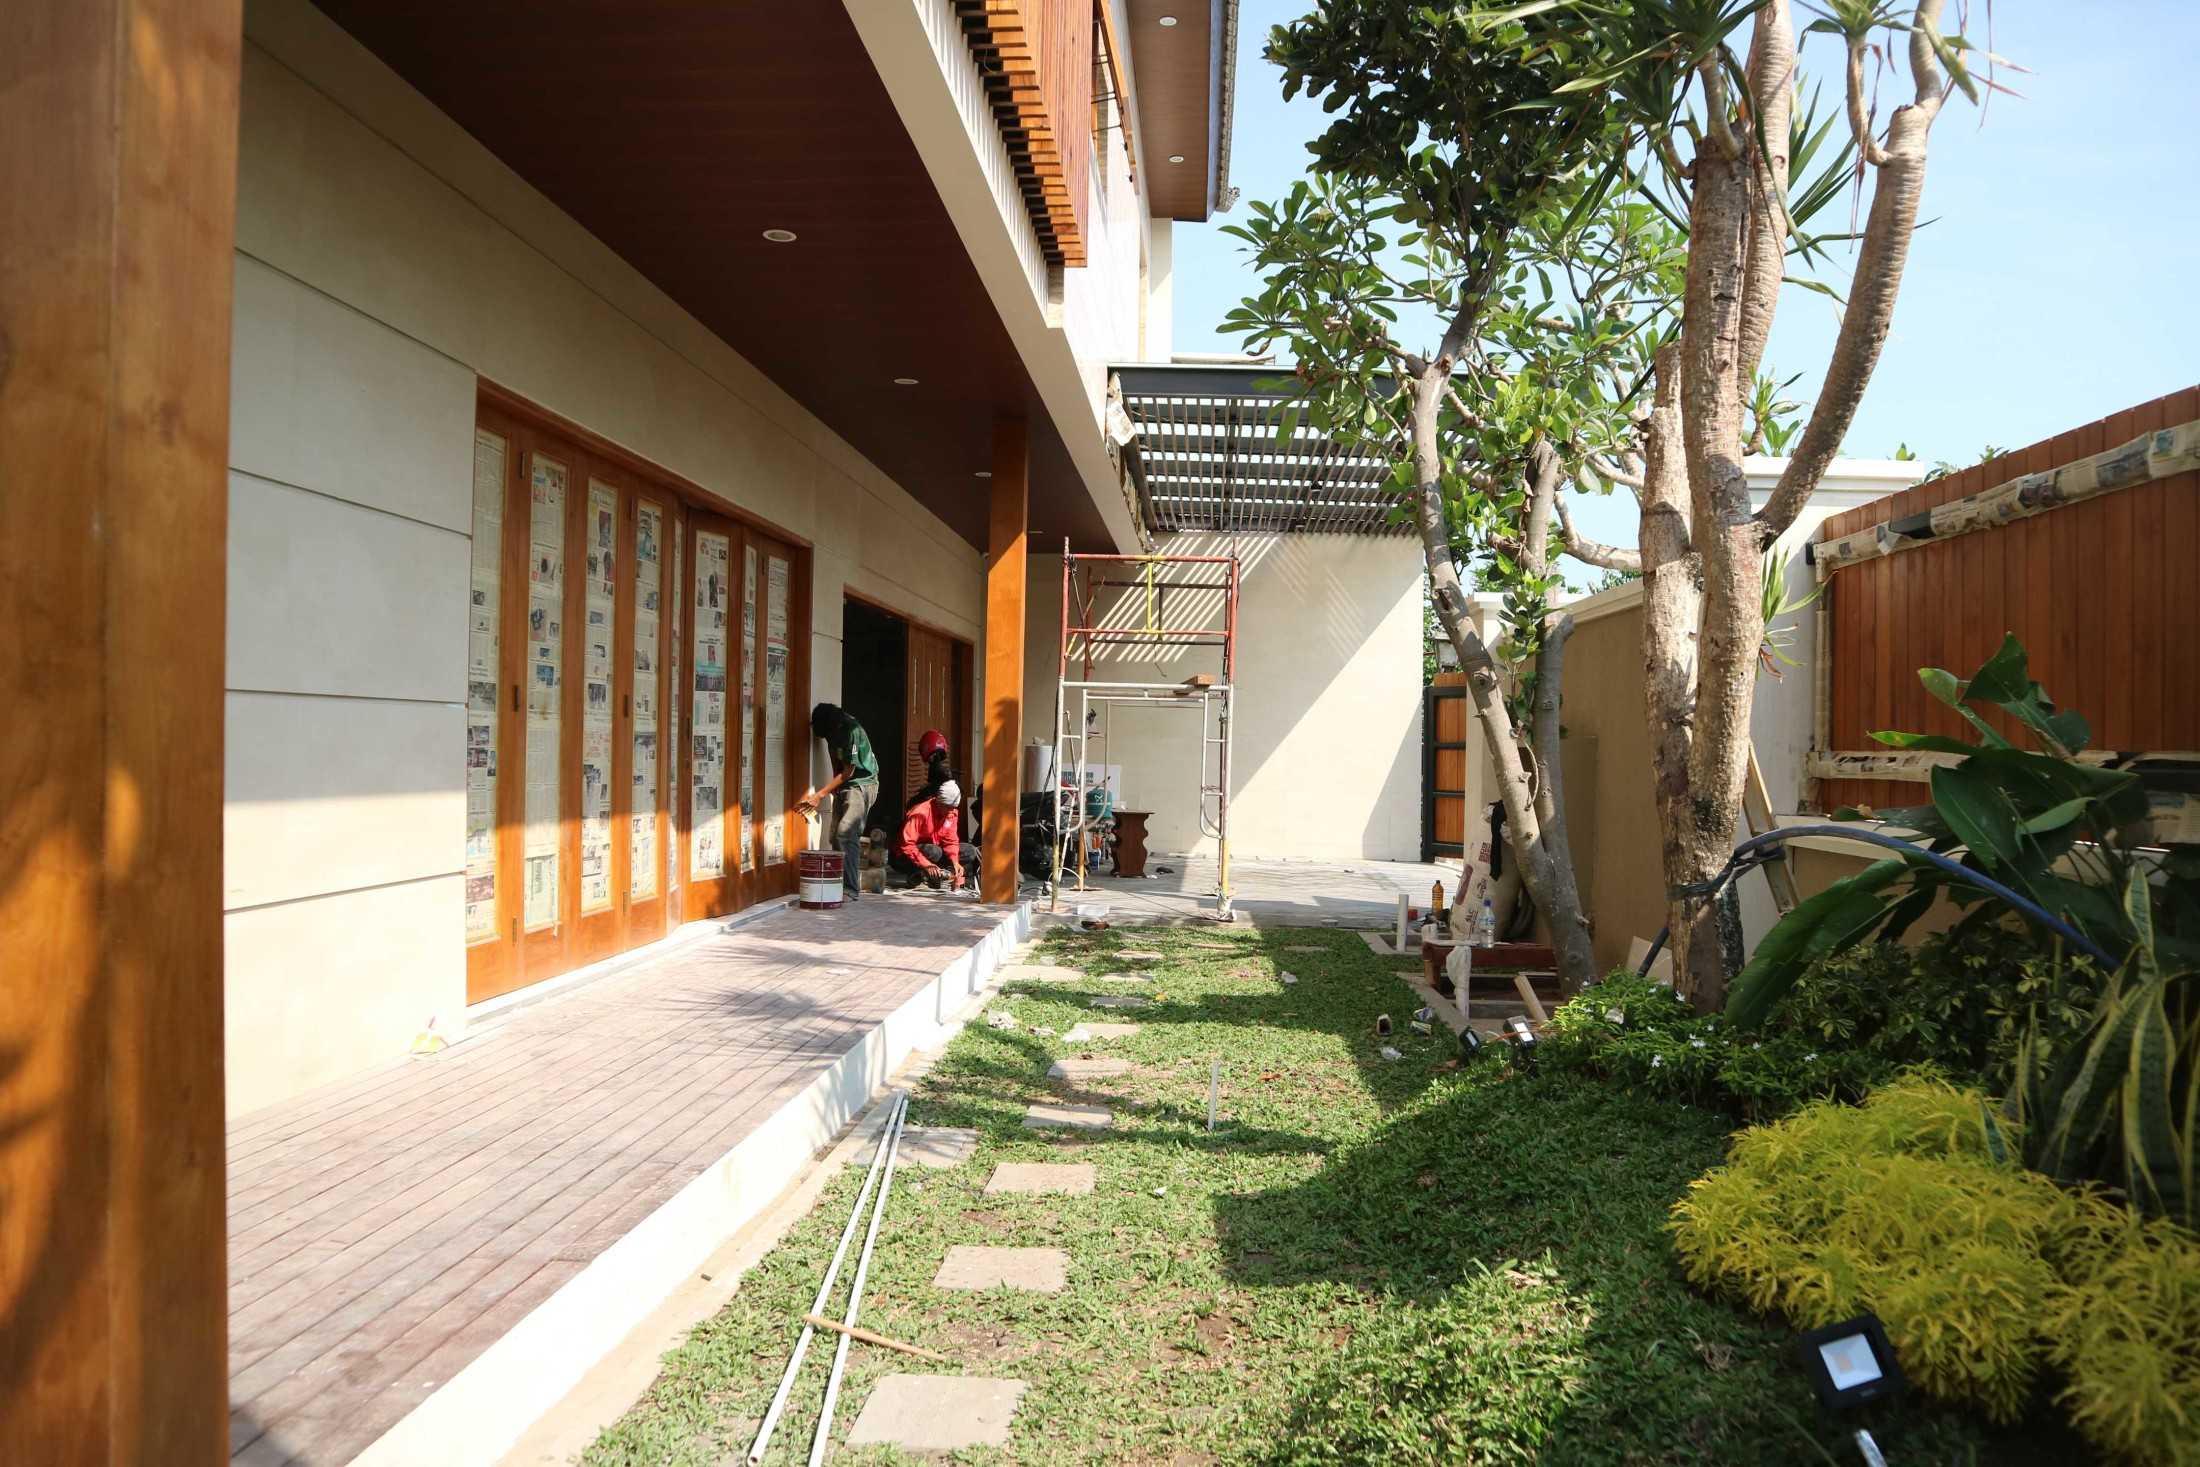 Arbiy Kreasi Rumah Pm Surabaya, Kota Sby, Jawa Timur, Indonesia Surabaya, Kota Sby, Jawa Timur, Indonesia Arbiy-Kreasi-Rumah-Pm  111201